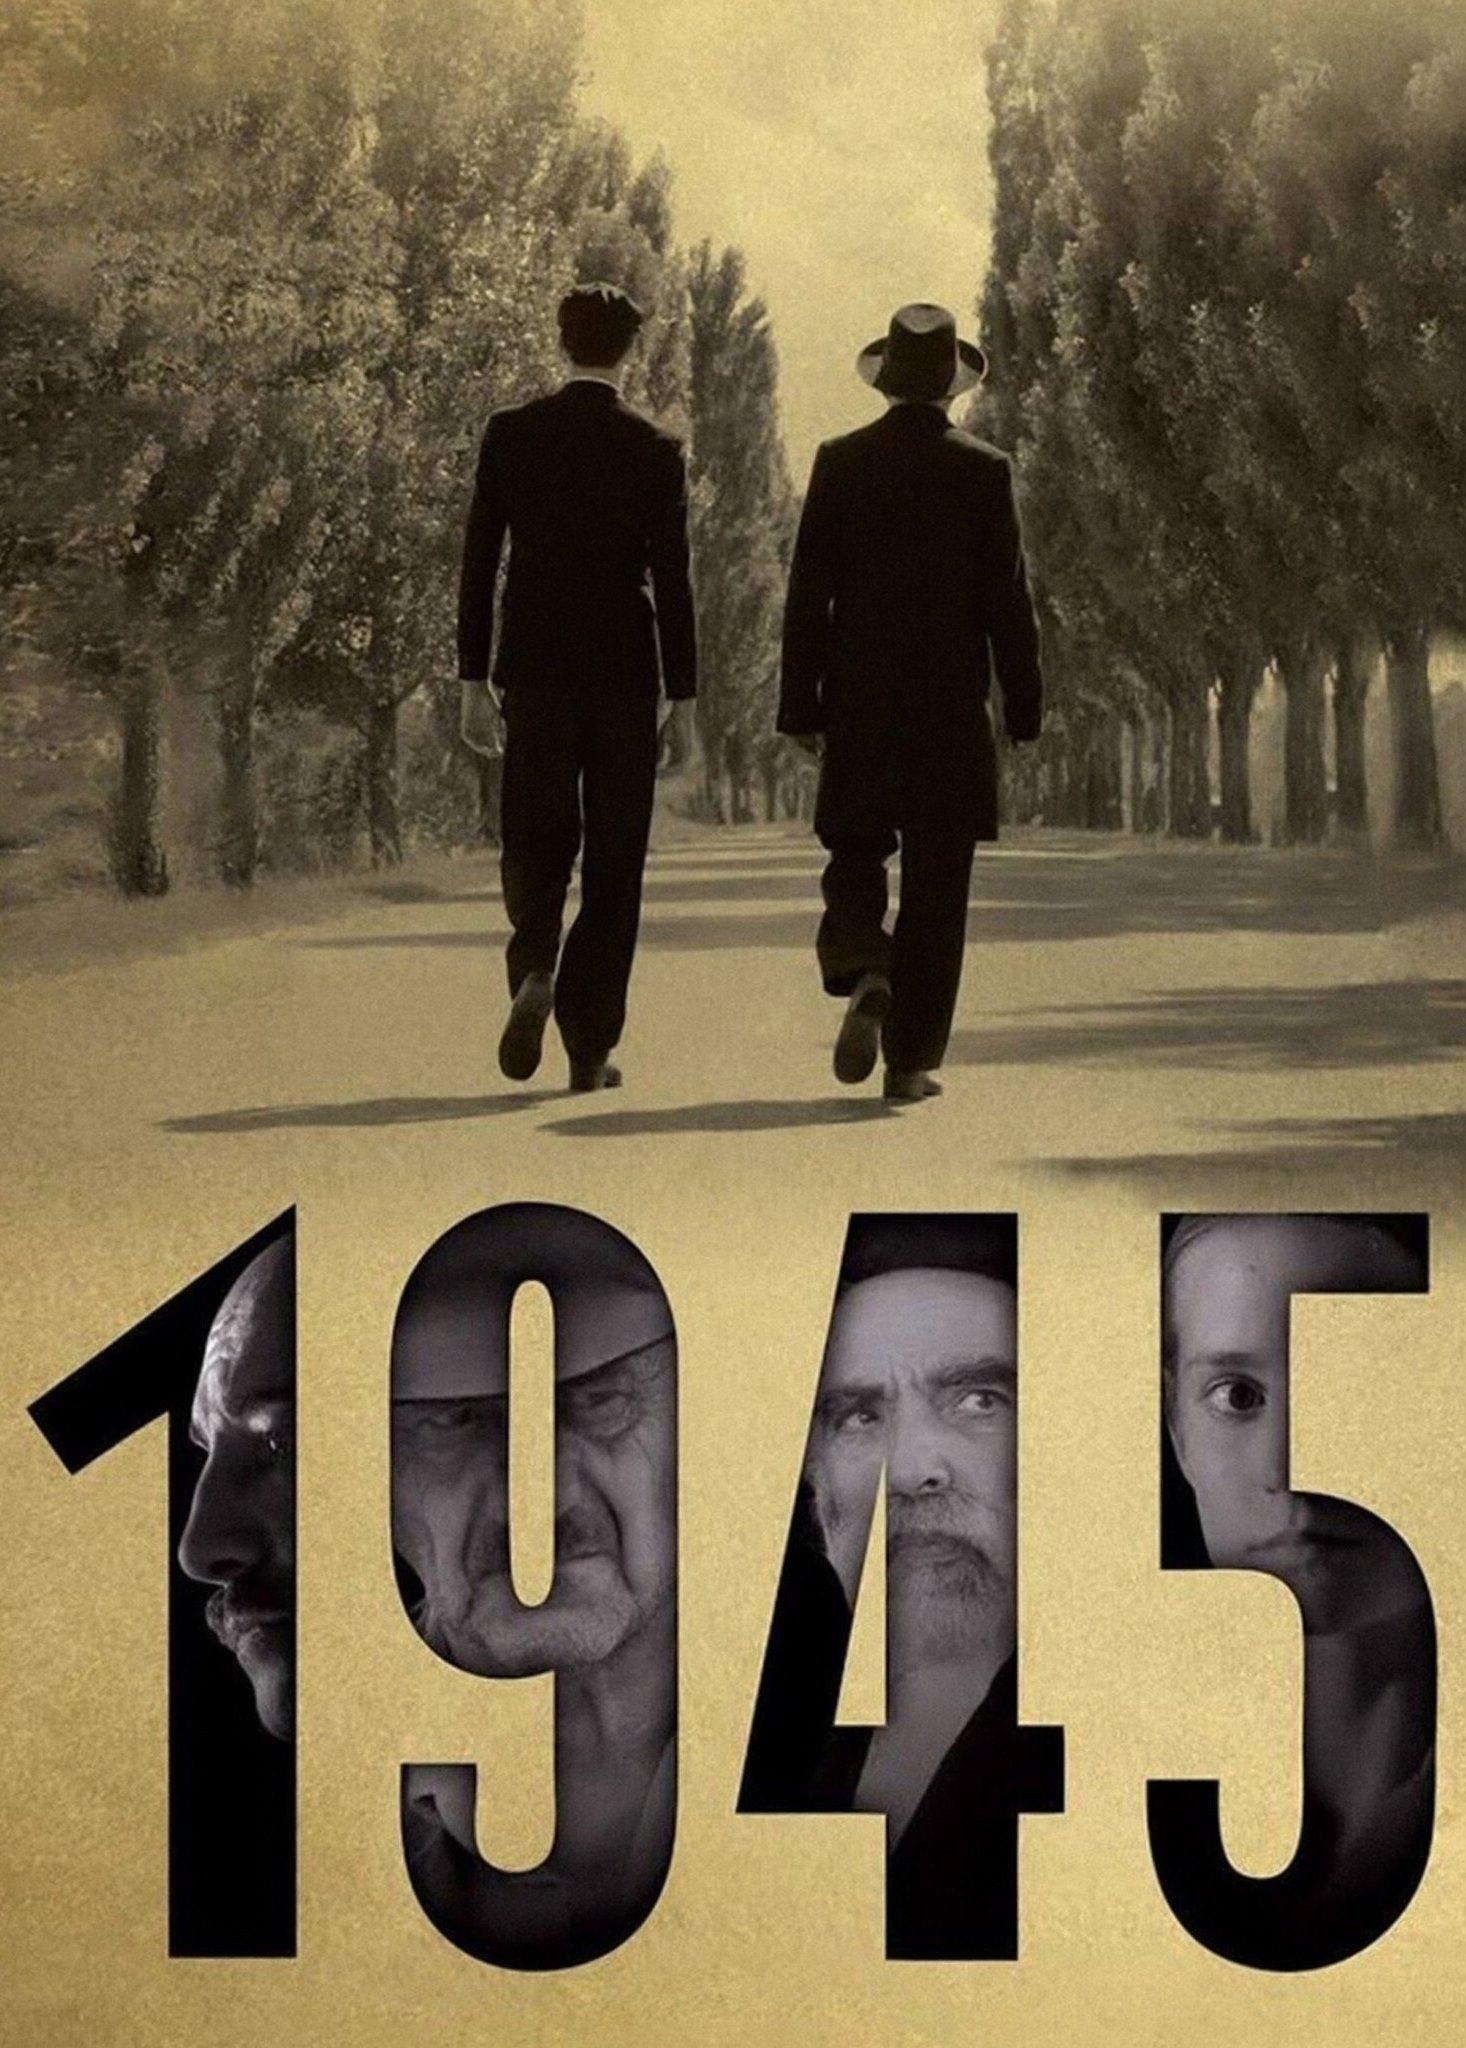 1945 [B/N] [HD] (2017)